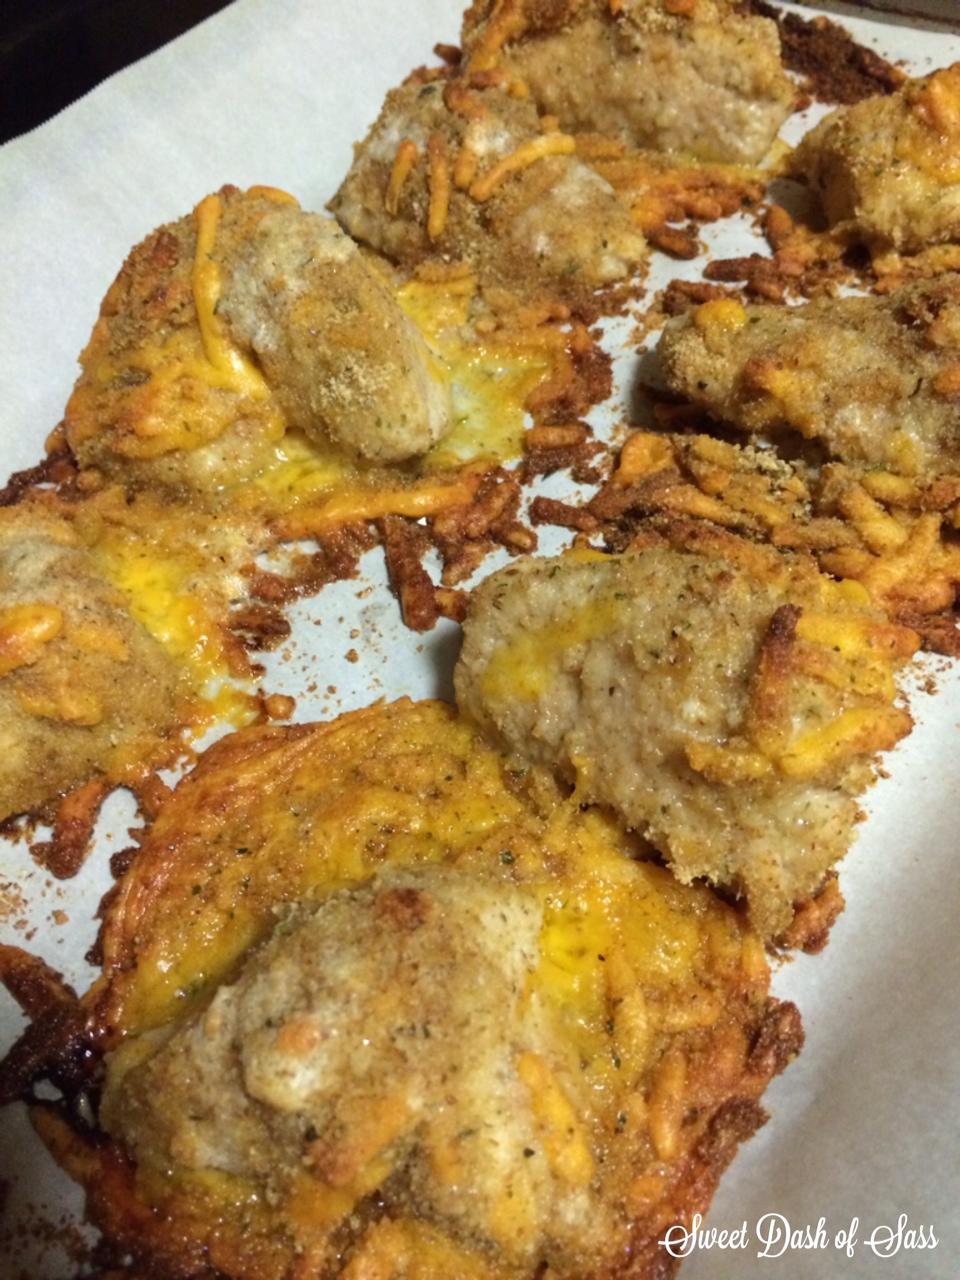 #3 - Crispy Cheddar Chicken - www.SweetDashofSass.com